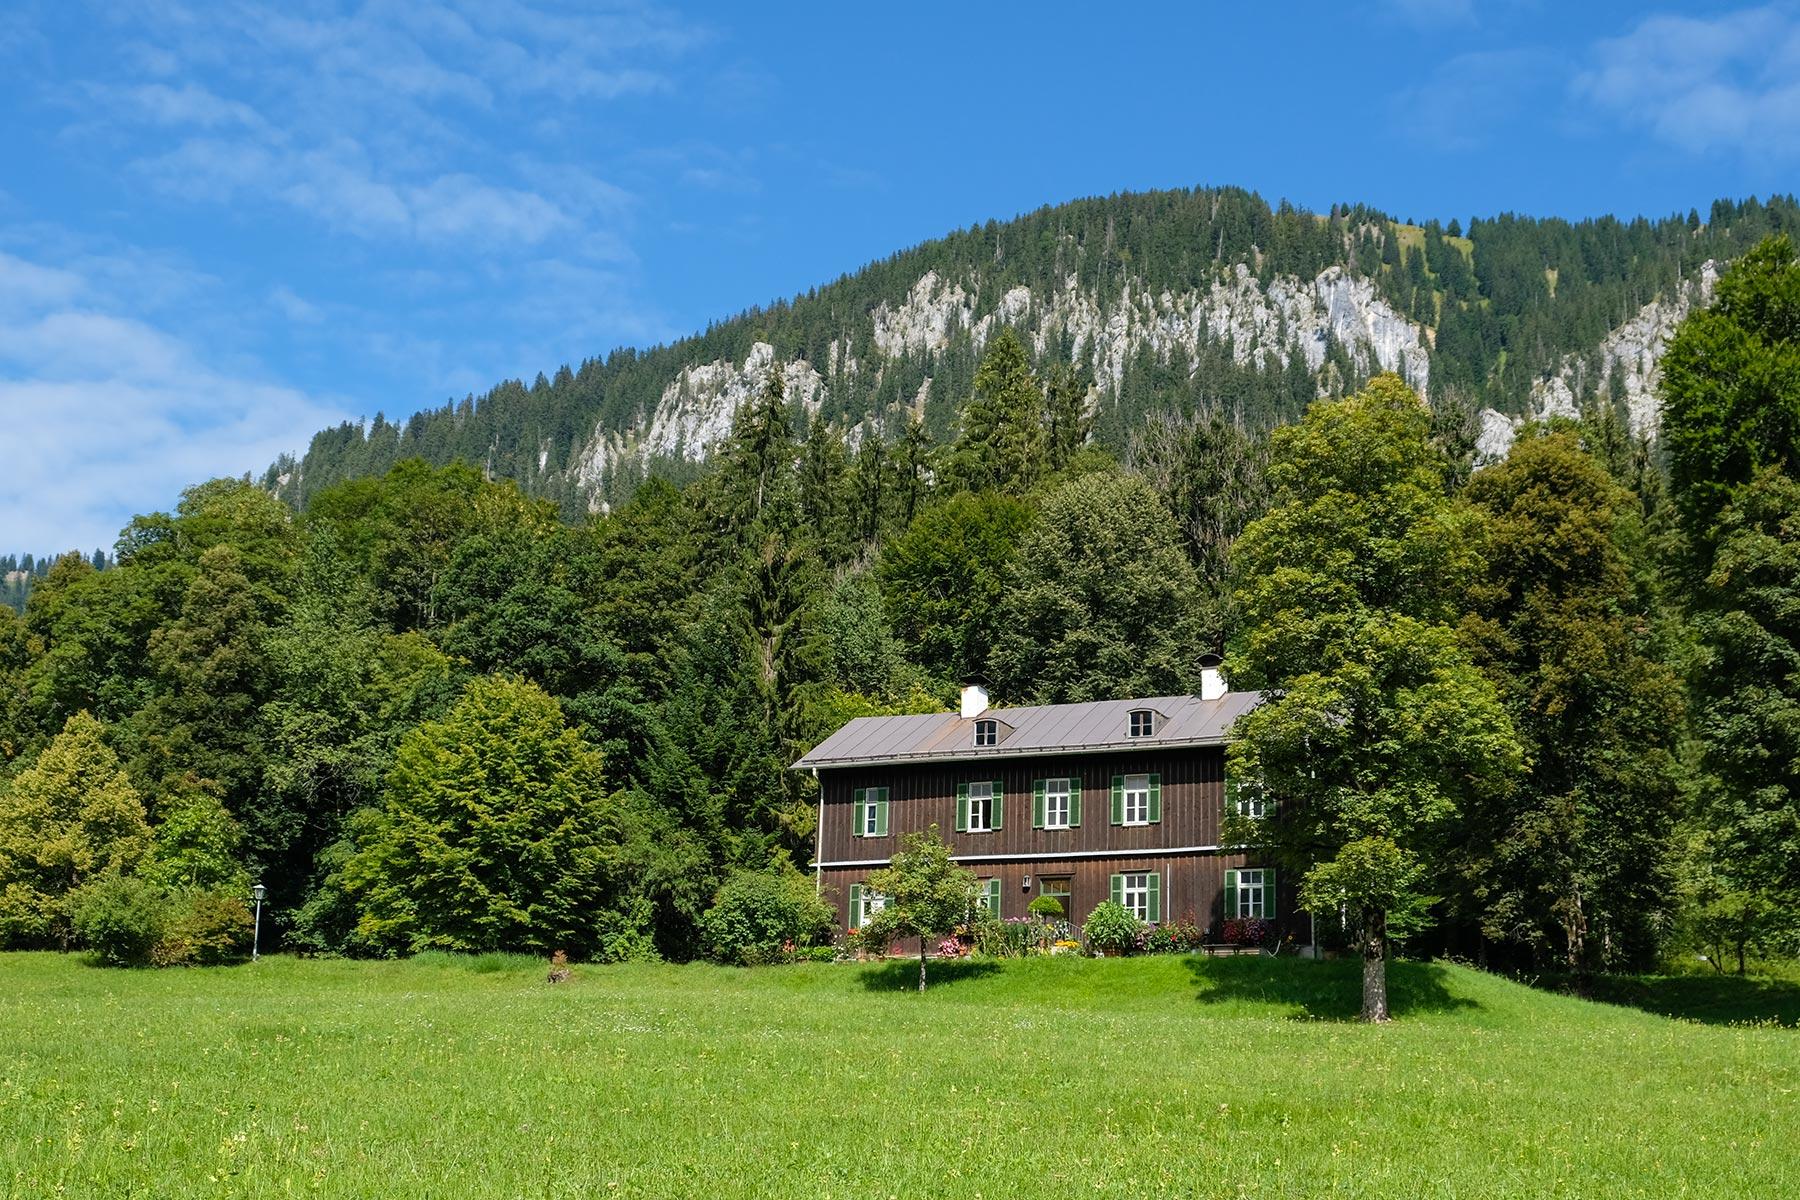 Ehemalige Bauhütte im Park Linderhof, Ettal